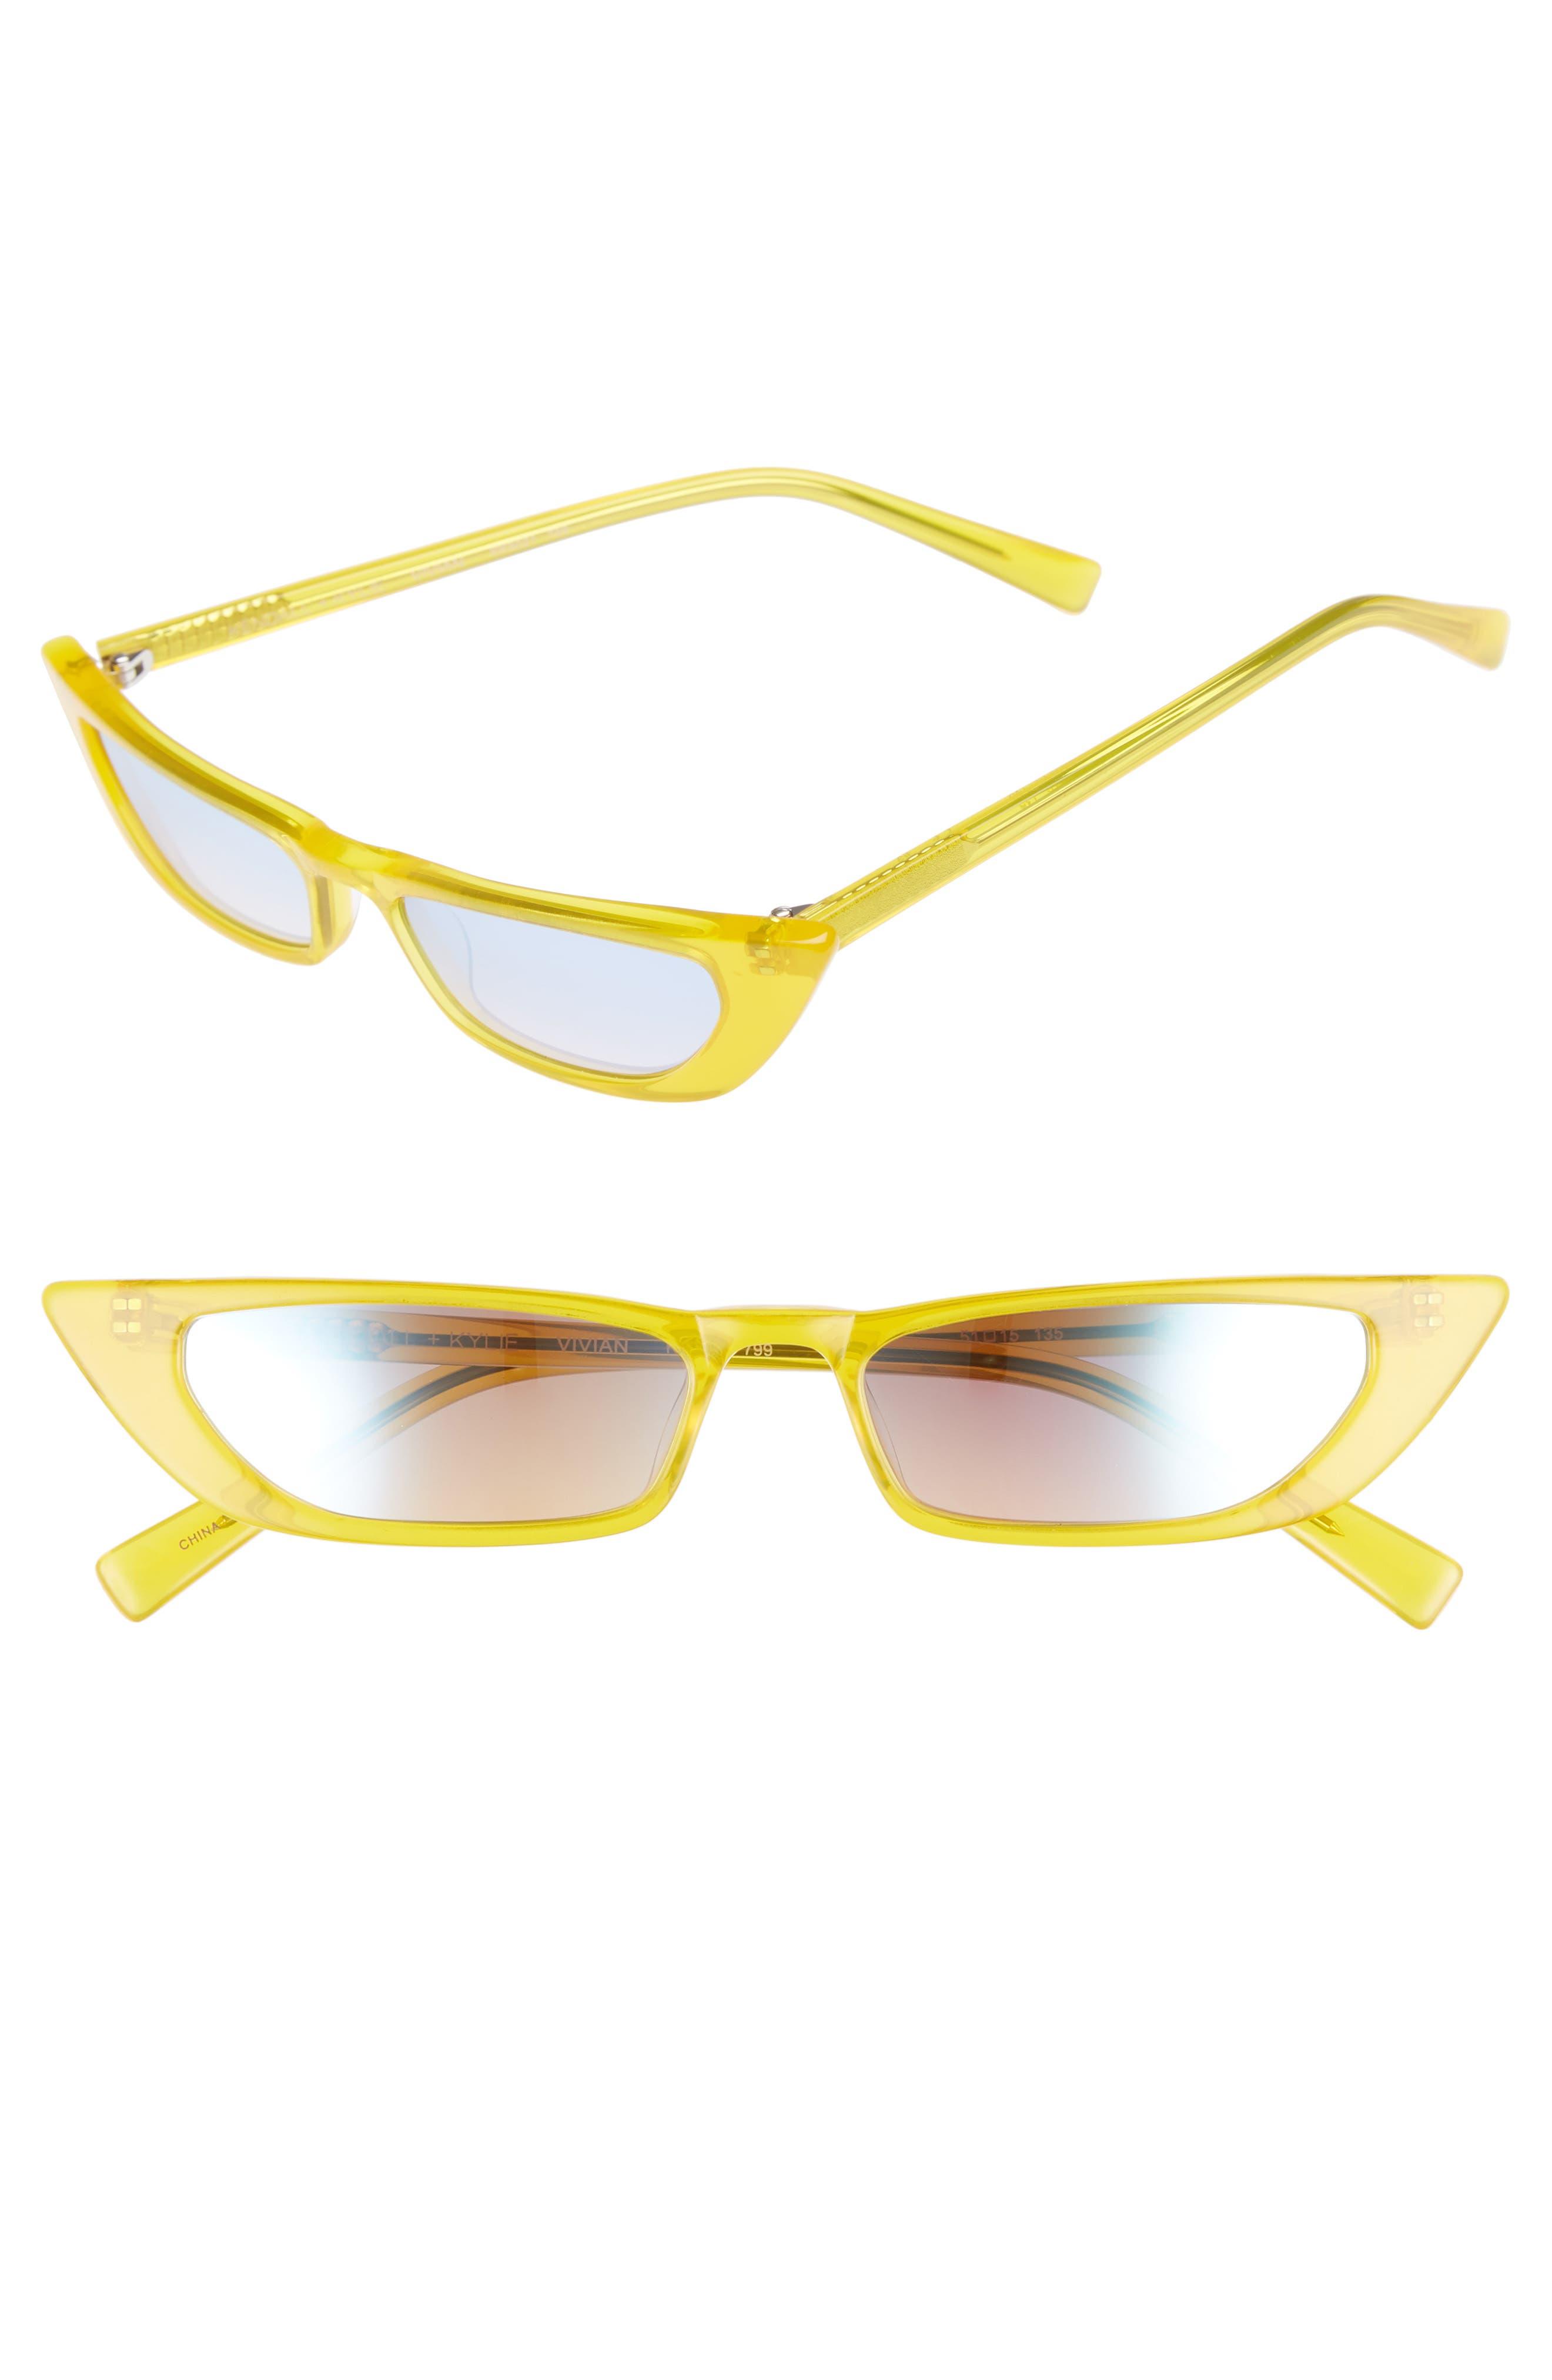 Vivian Extreme 51mm Cat Eye Sunglasses,                         Main,                         color, SUN CITY YELLOW/ SOLID SMOKE